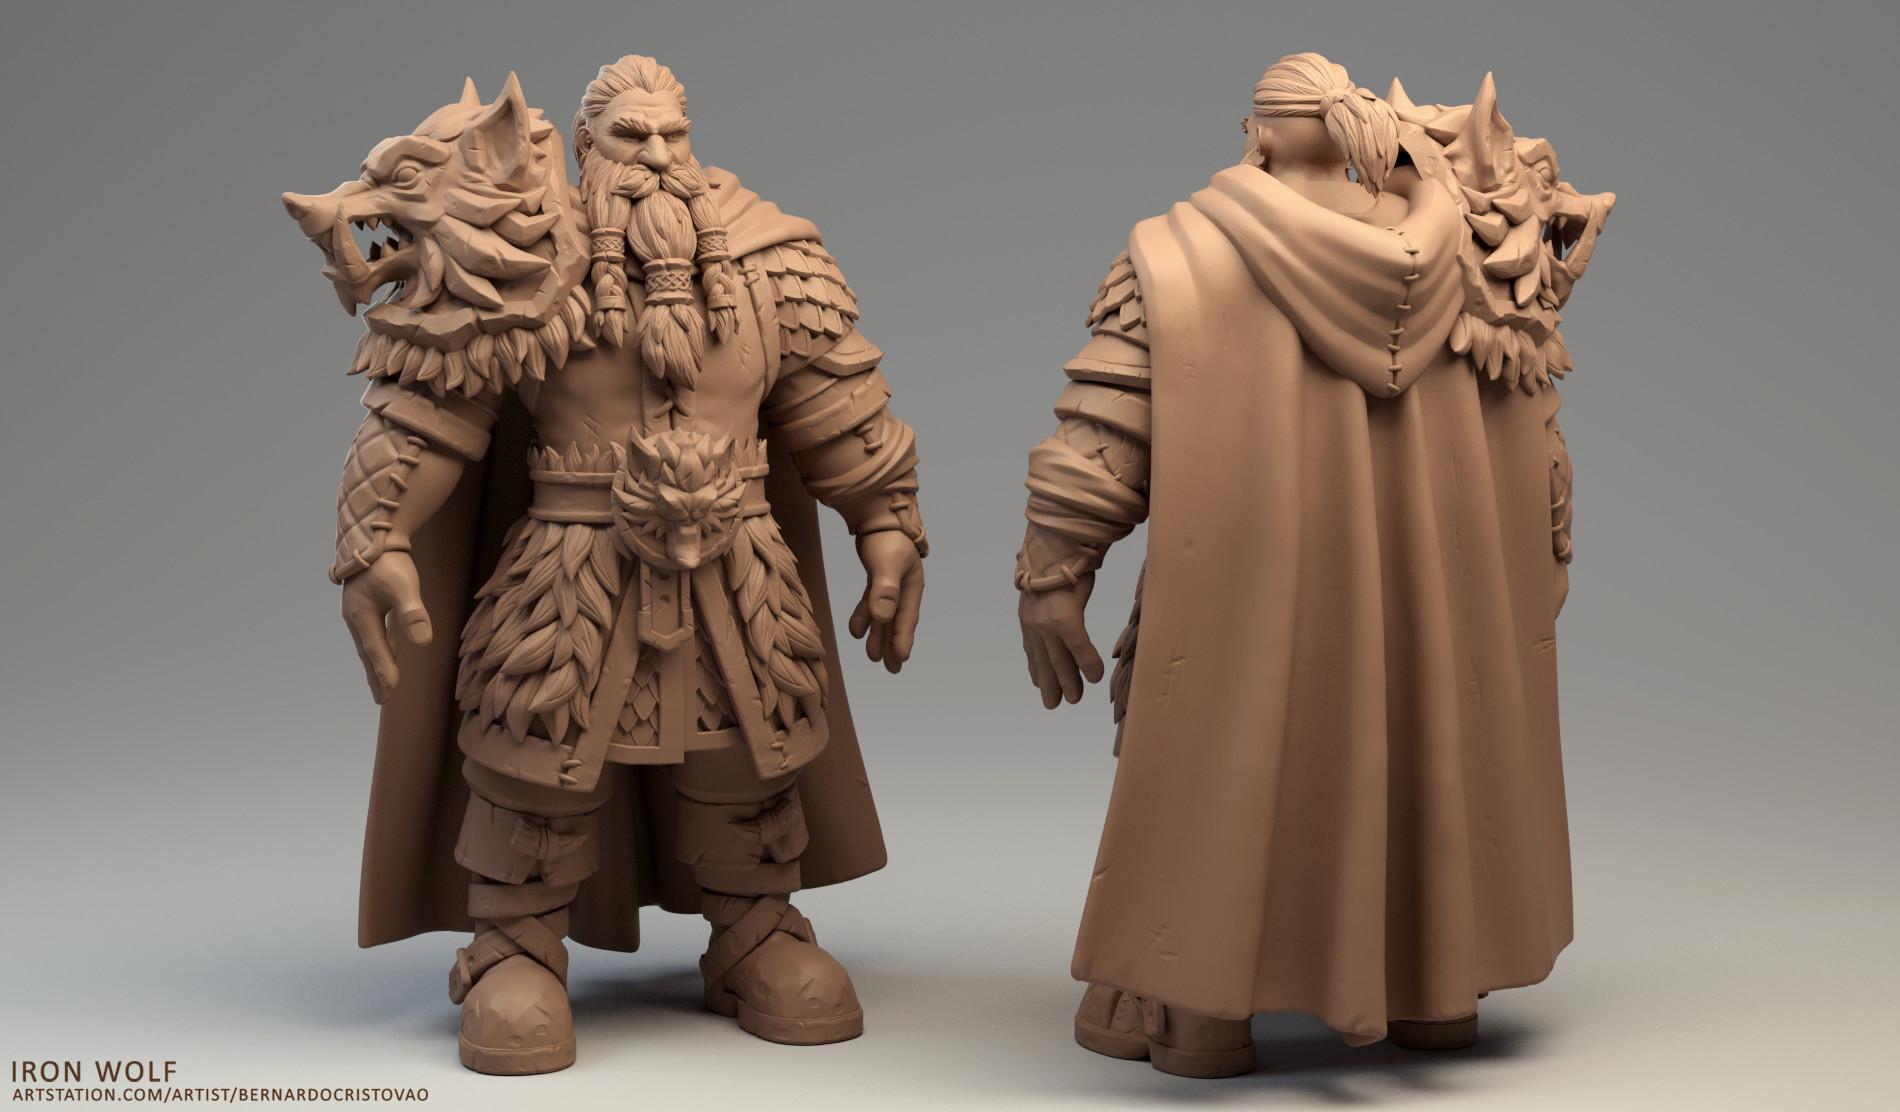 Bernardo cristovao ironwolf clay02